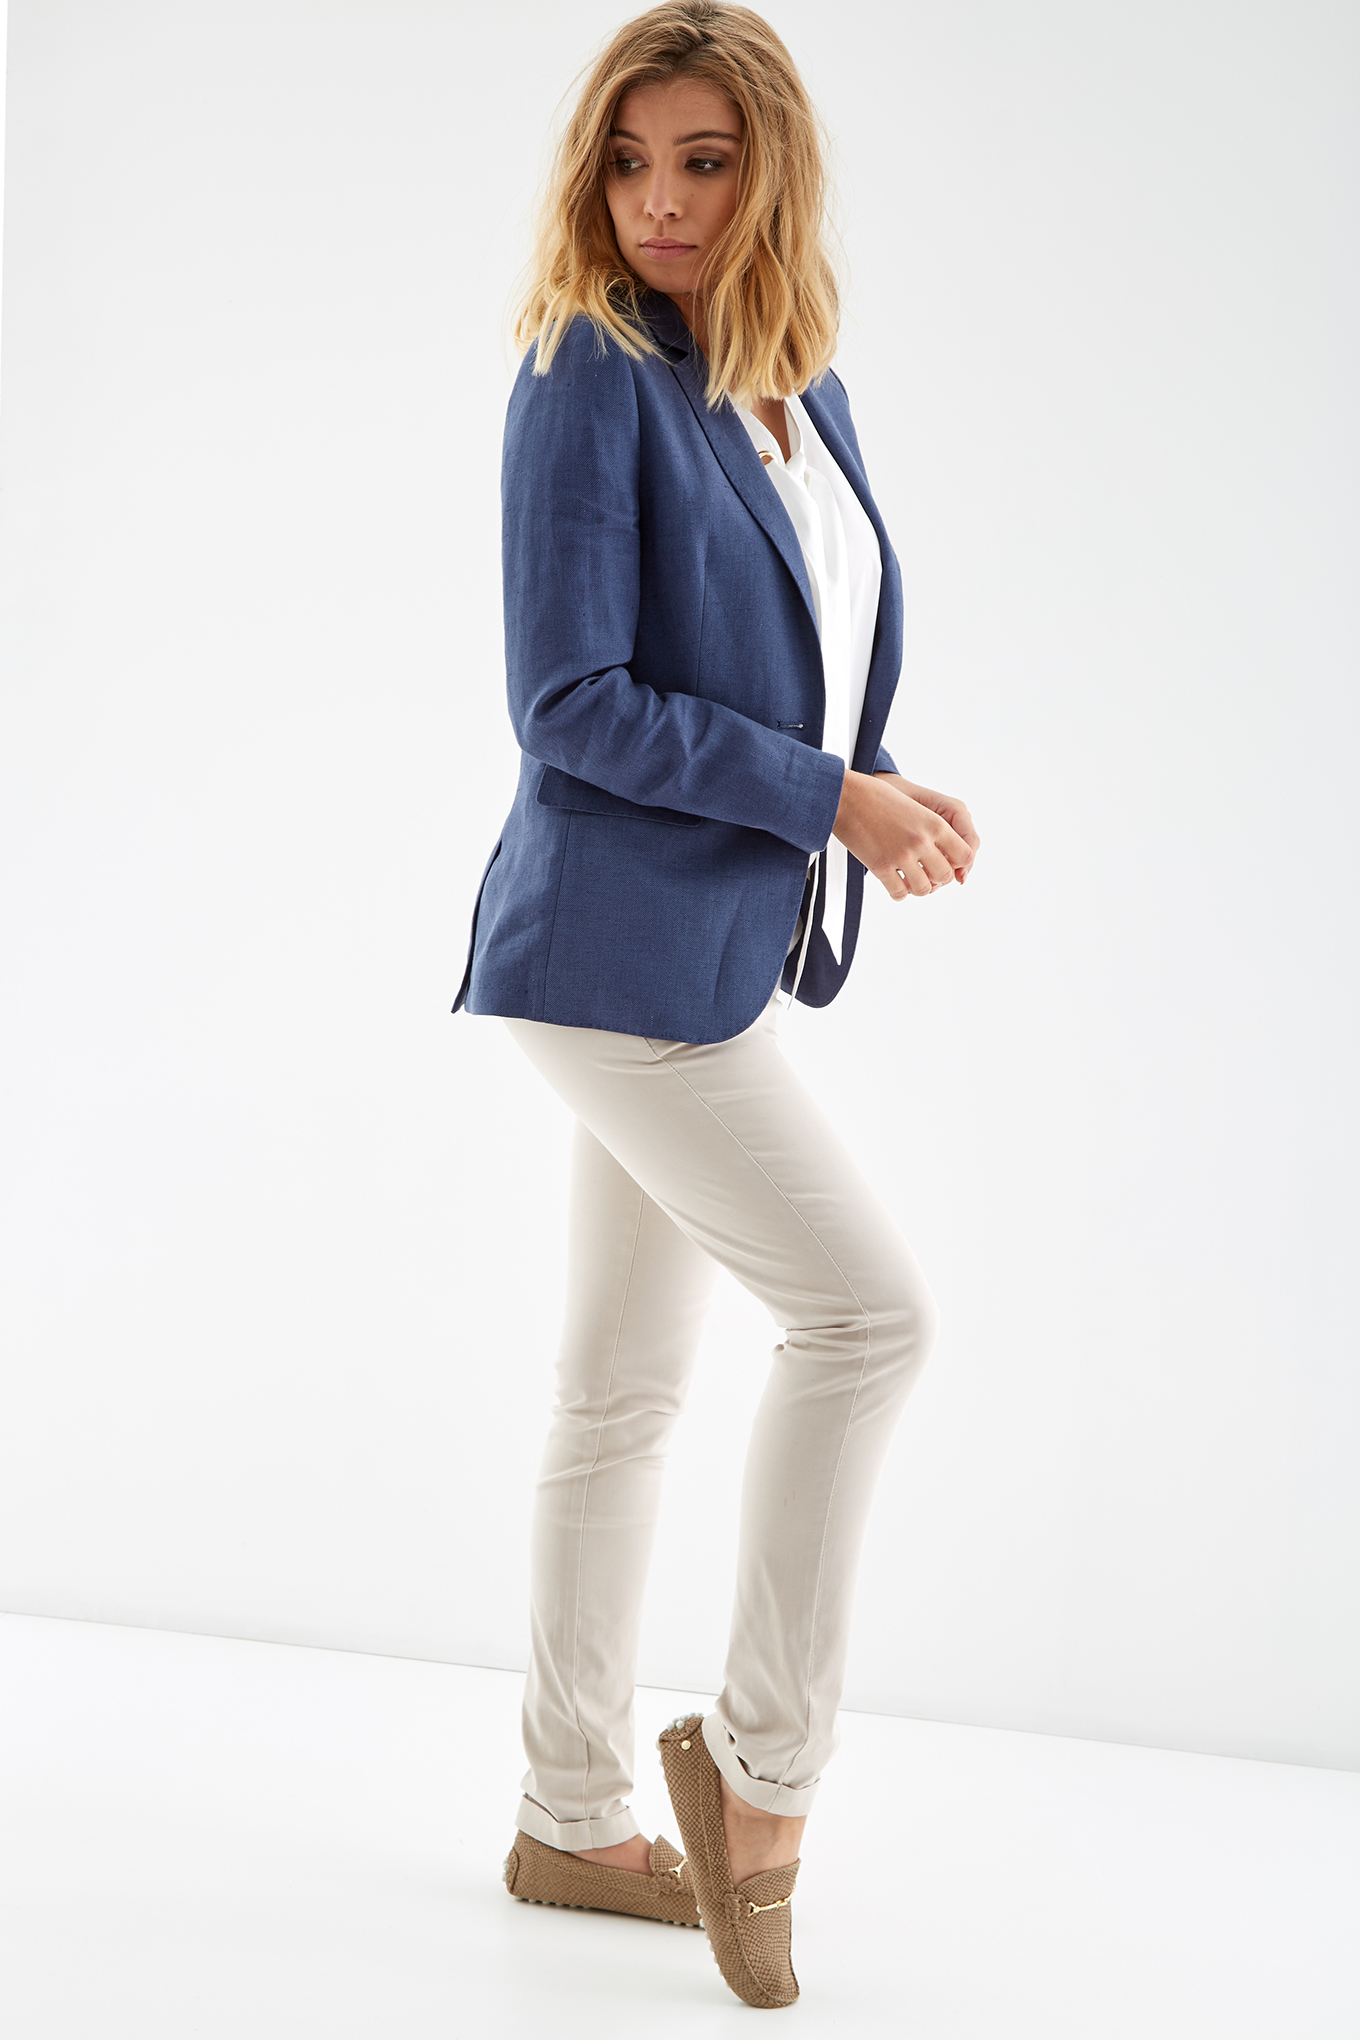 Blazer Blue Classic Woman